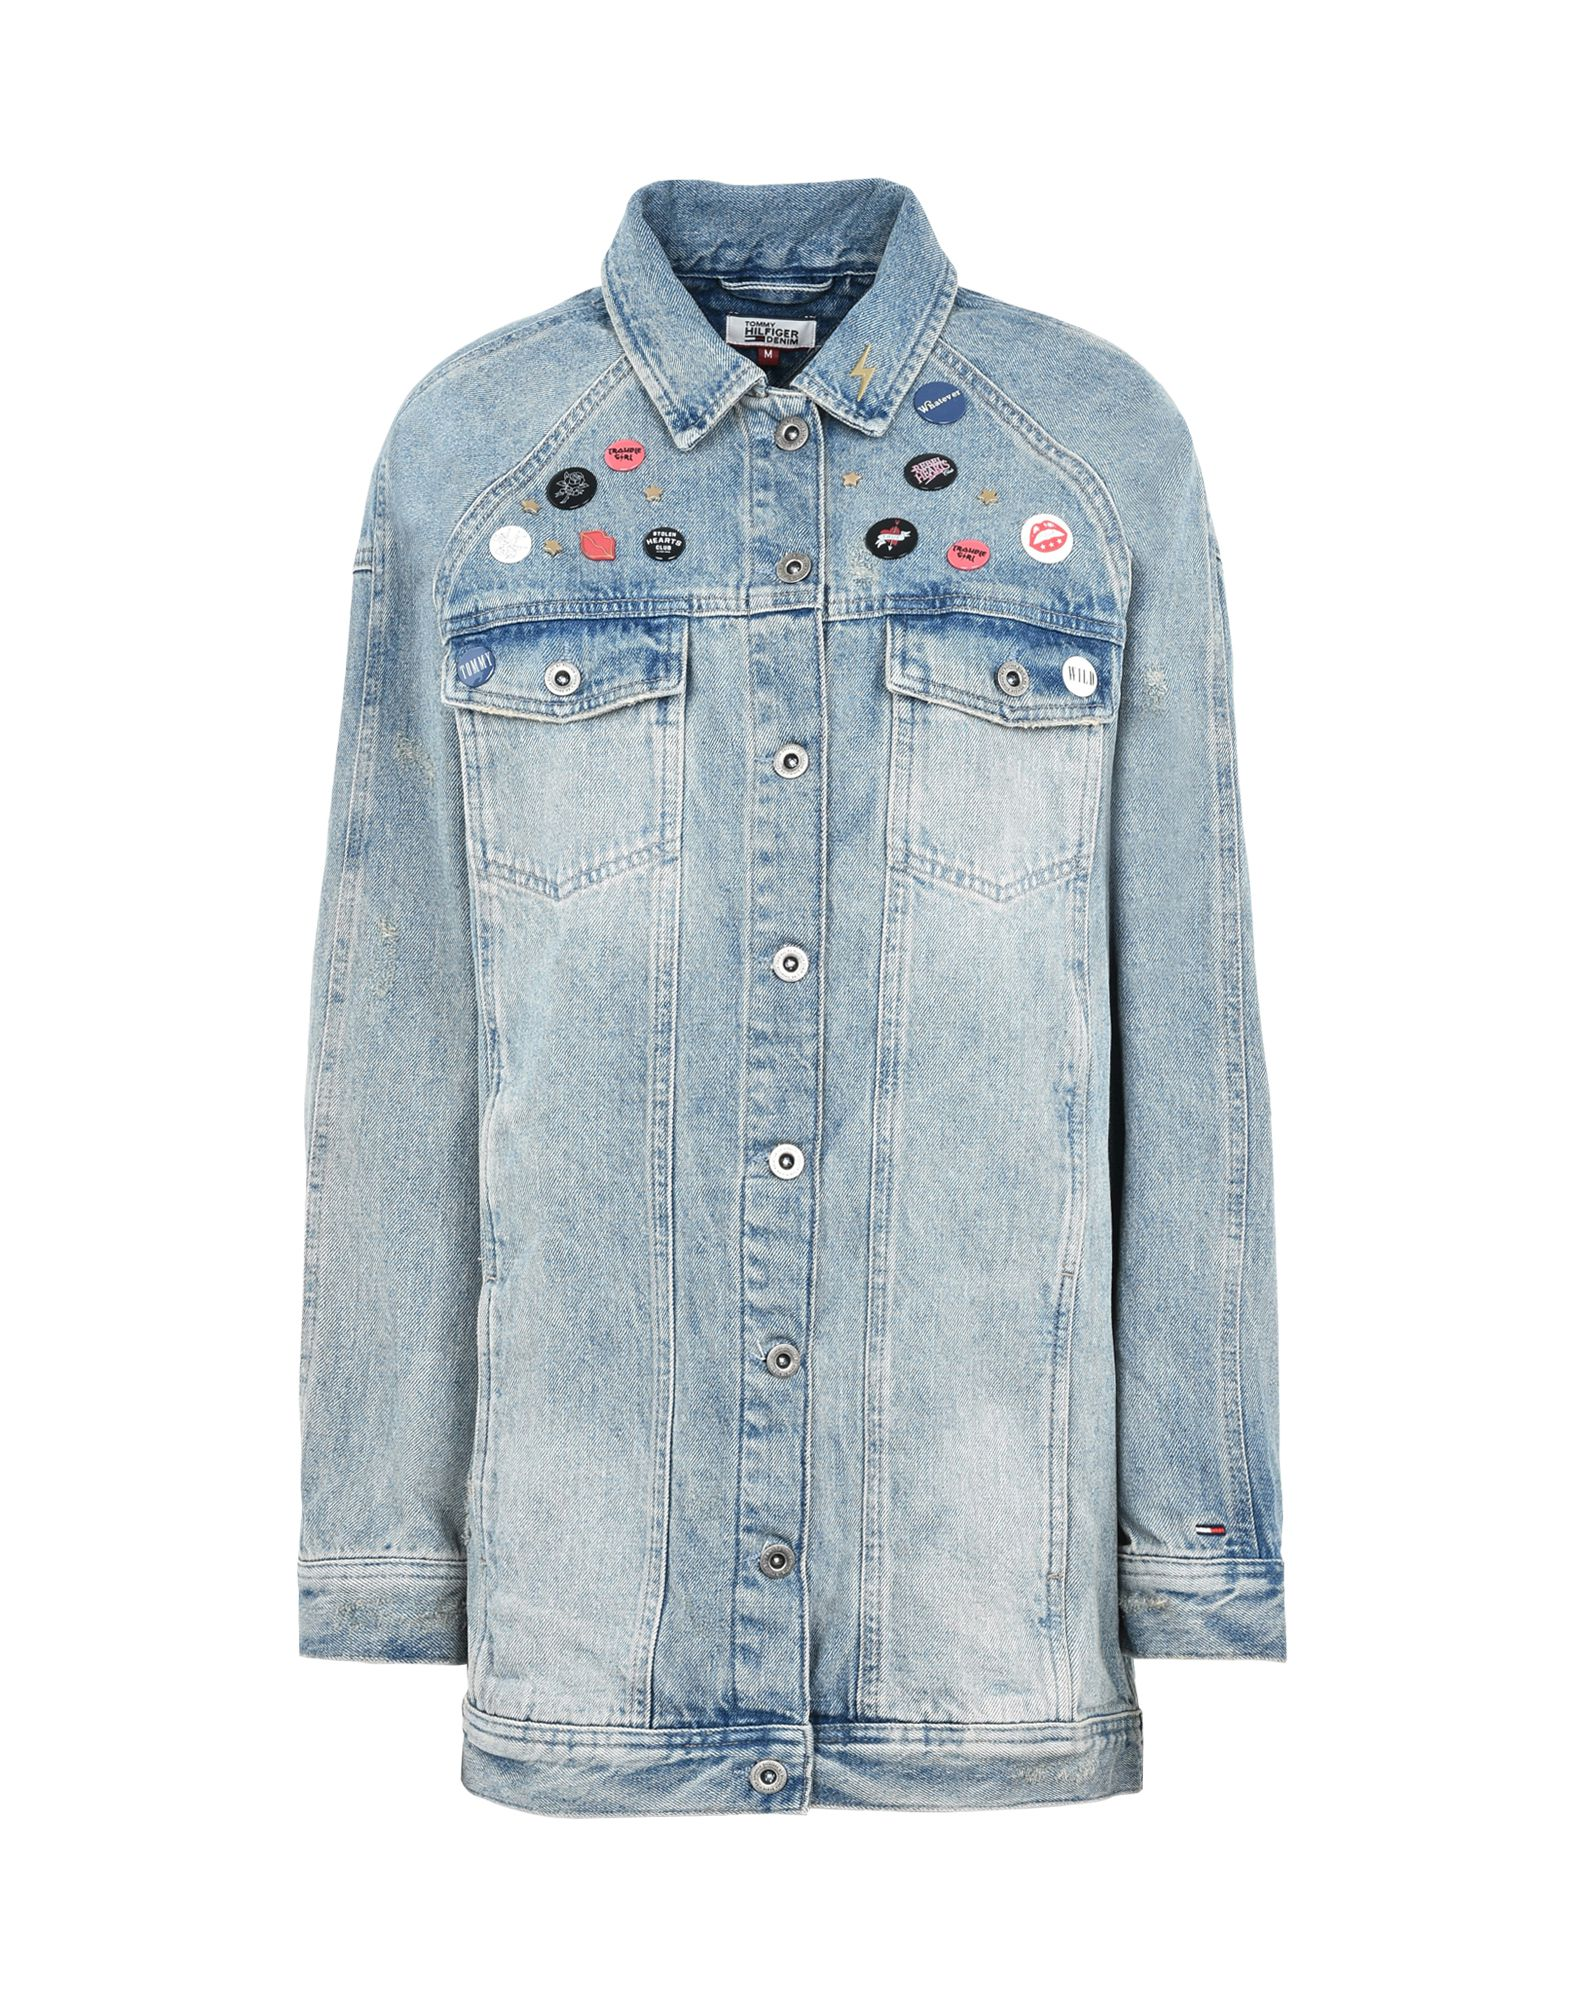 TOMMY HILFIGER DENIM Джинсовая верхняя одежда футболка tommy hilfiger denim tommy hilfiger denim to013ewtpb98